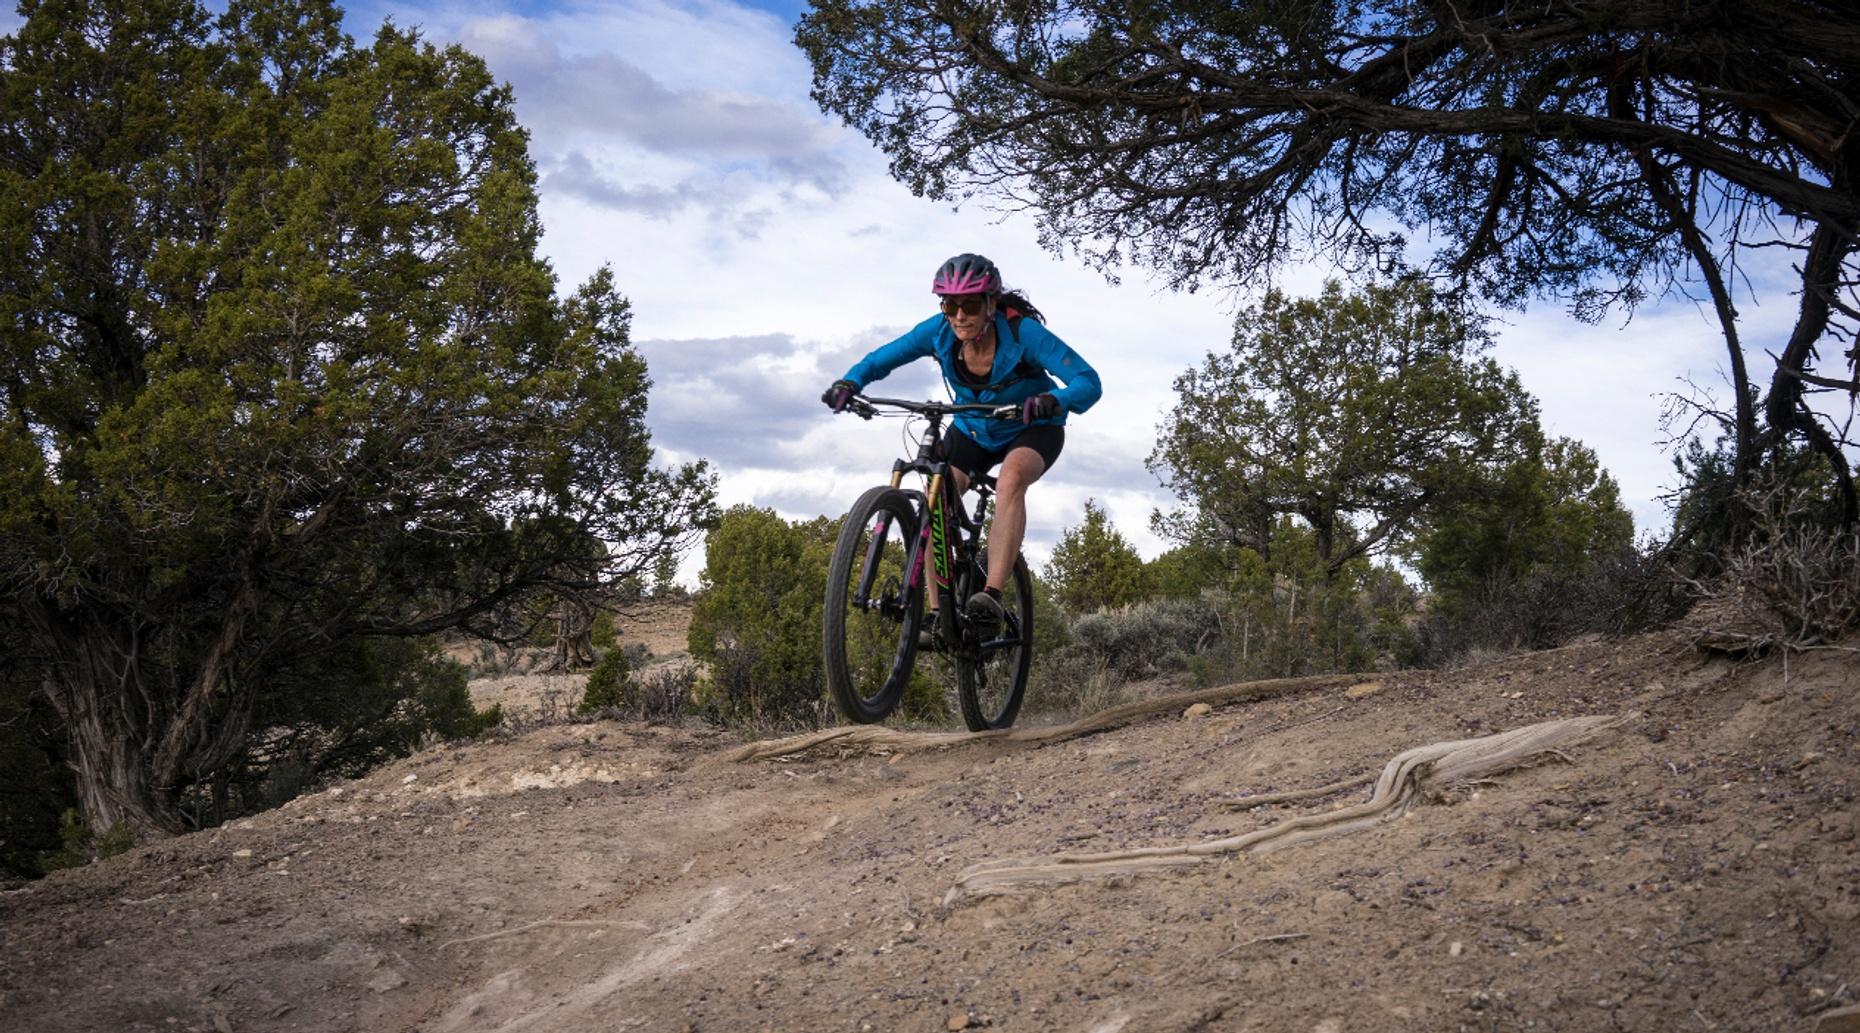 Weekend Afternoon Mountain Biking Shuttle from Ashland